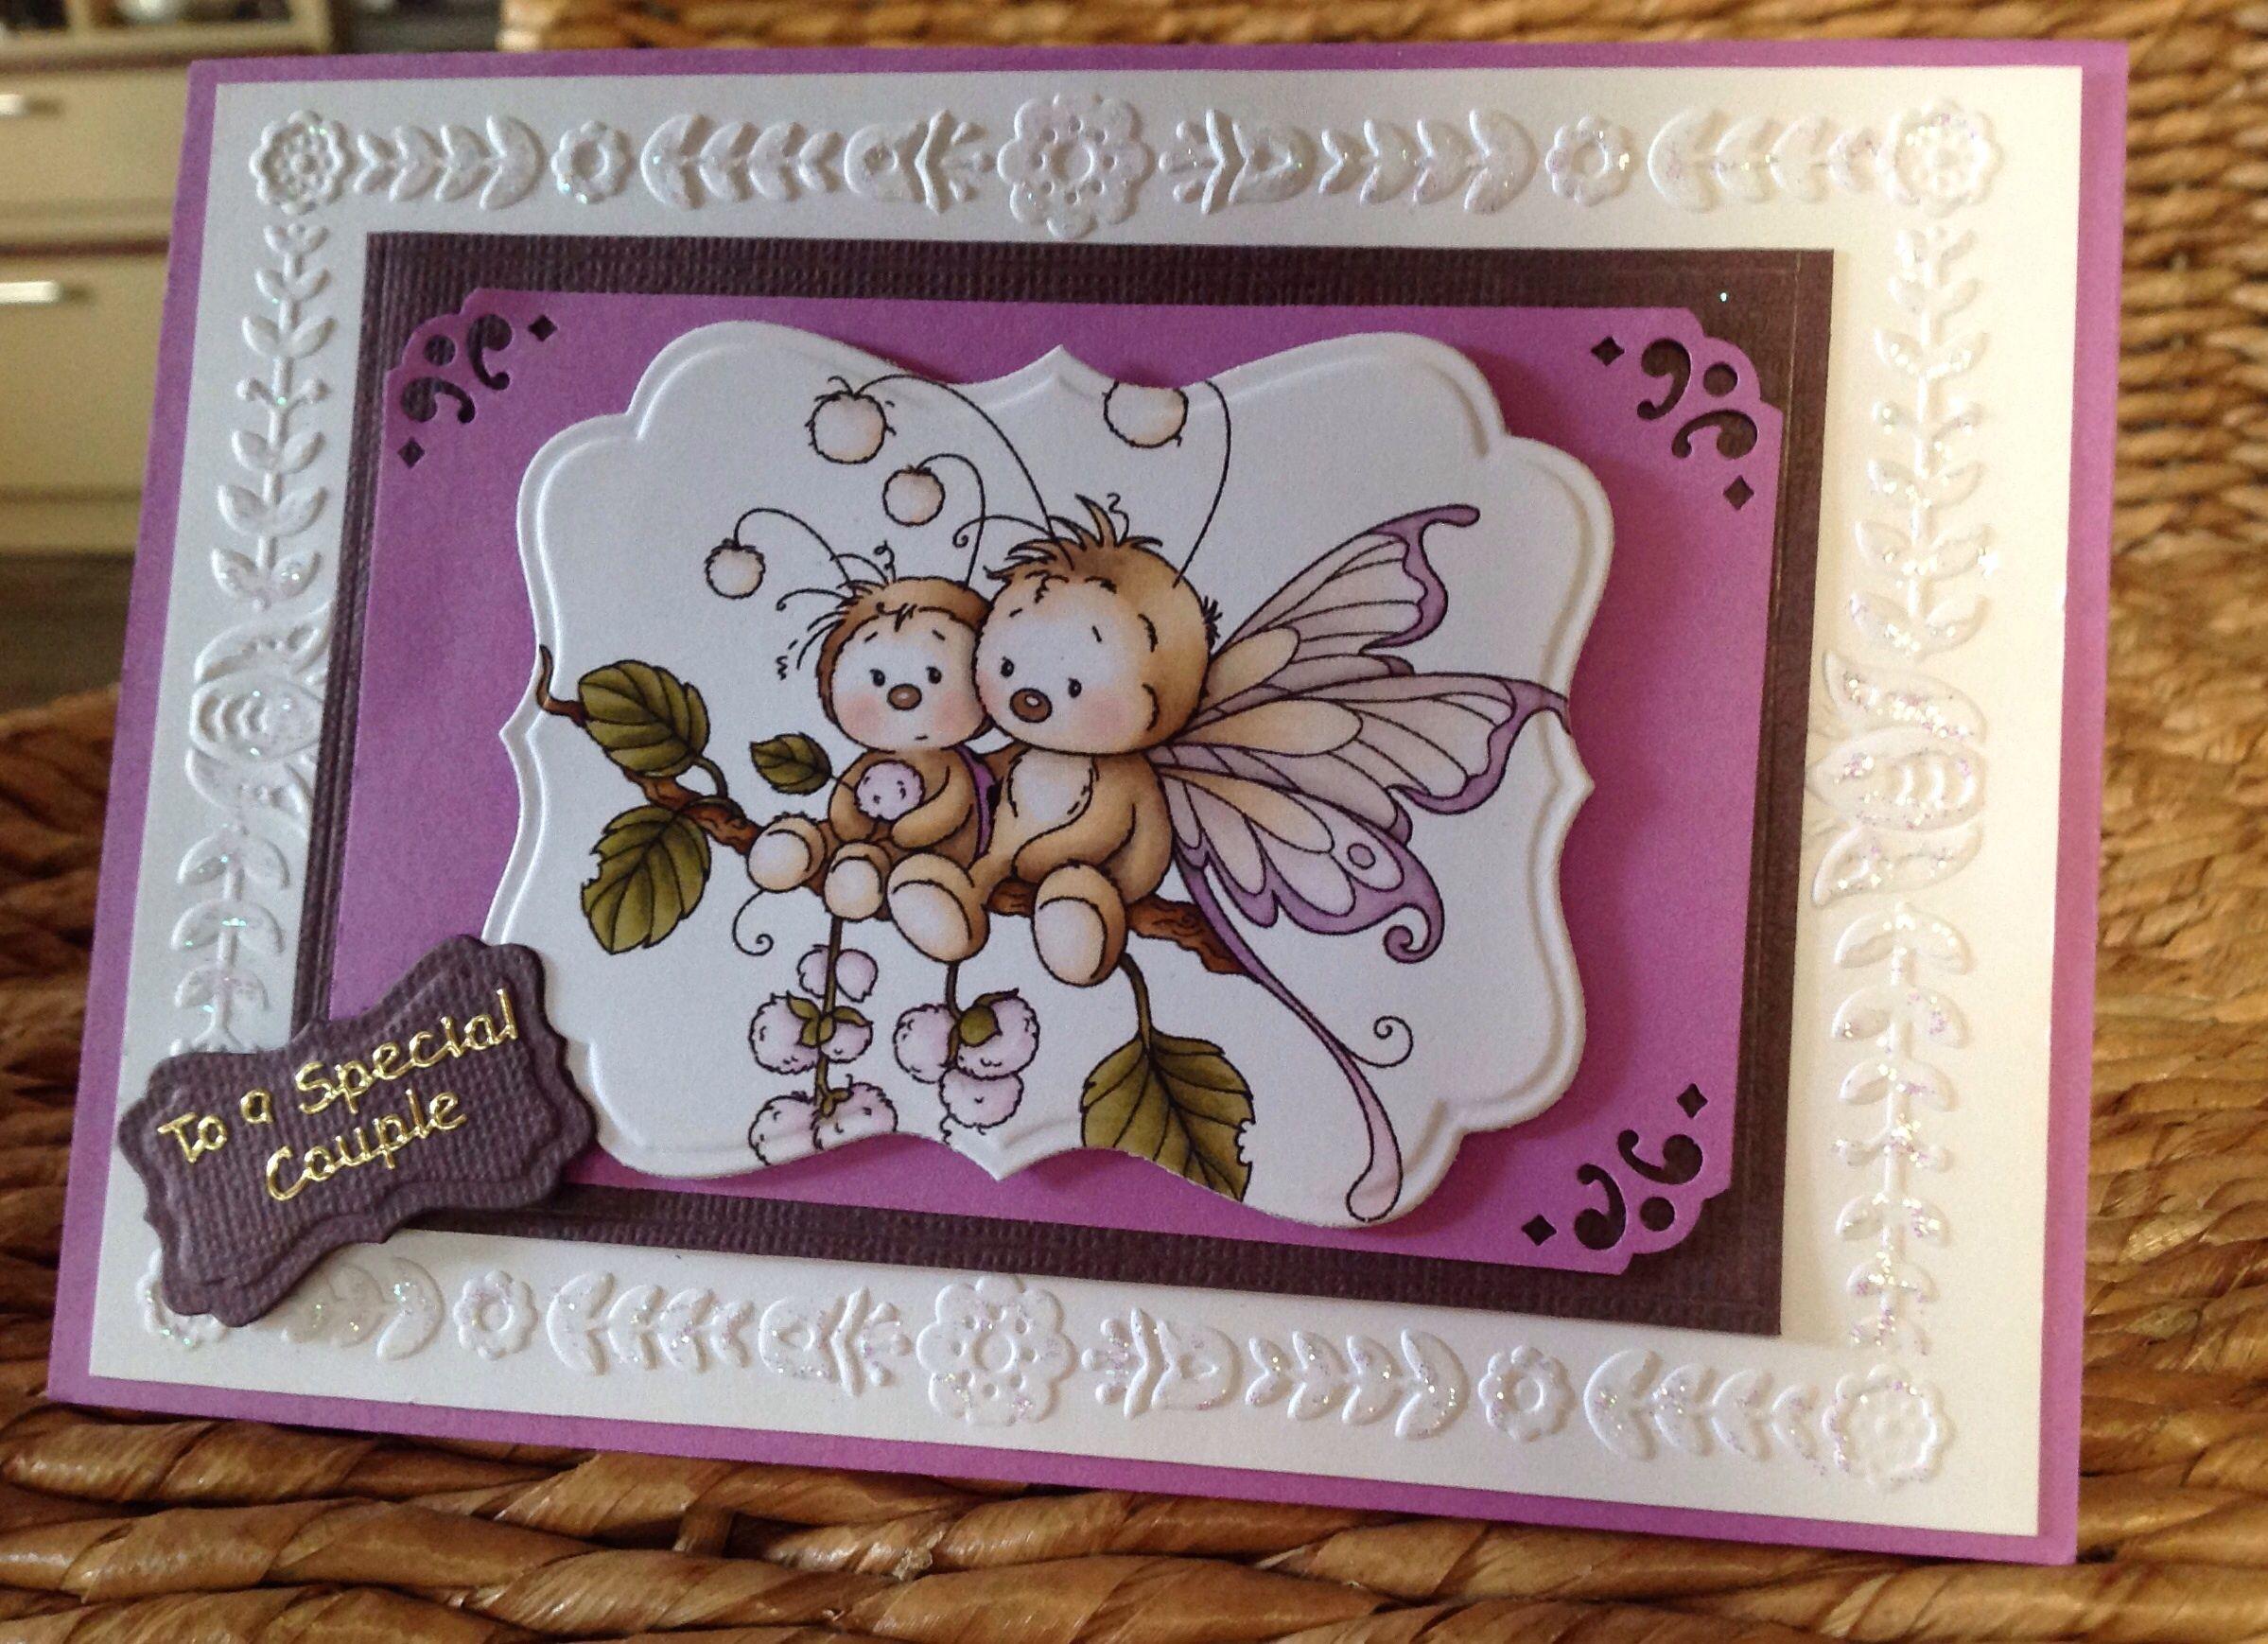 Card Making Ideas Using Embossing Folders Part - 48: Anniversary Card Using Darice Floral Border Embossing Folder